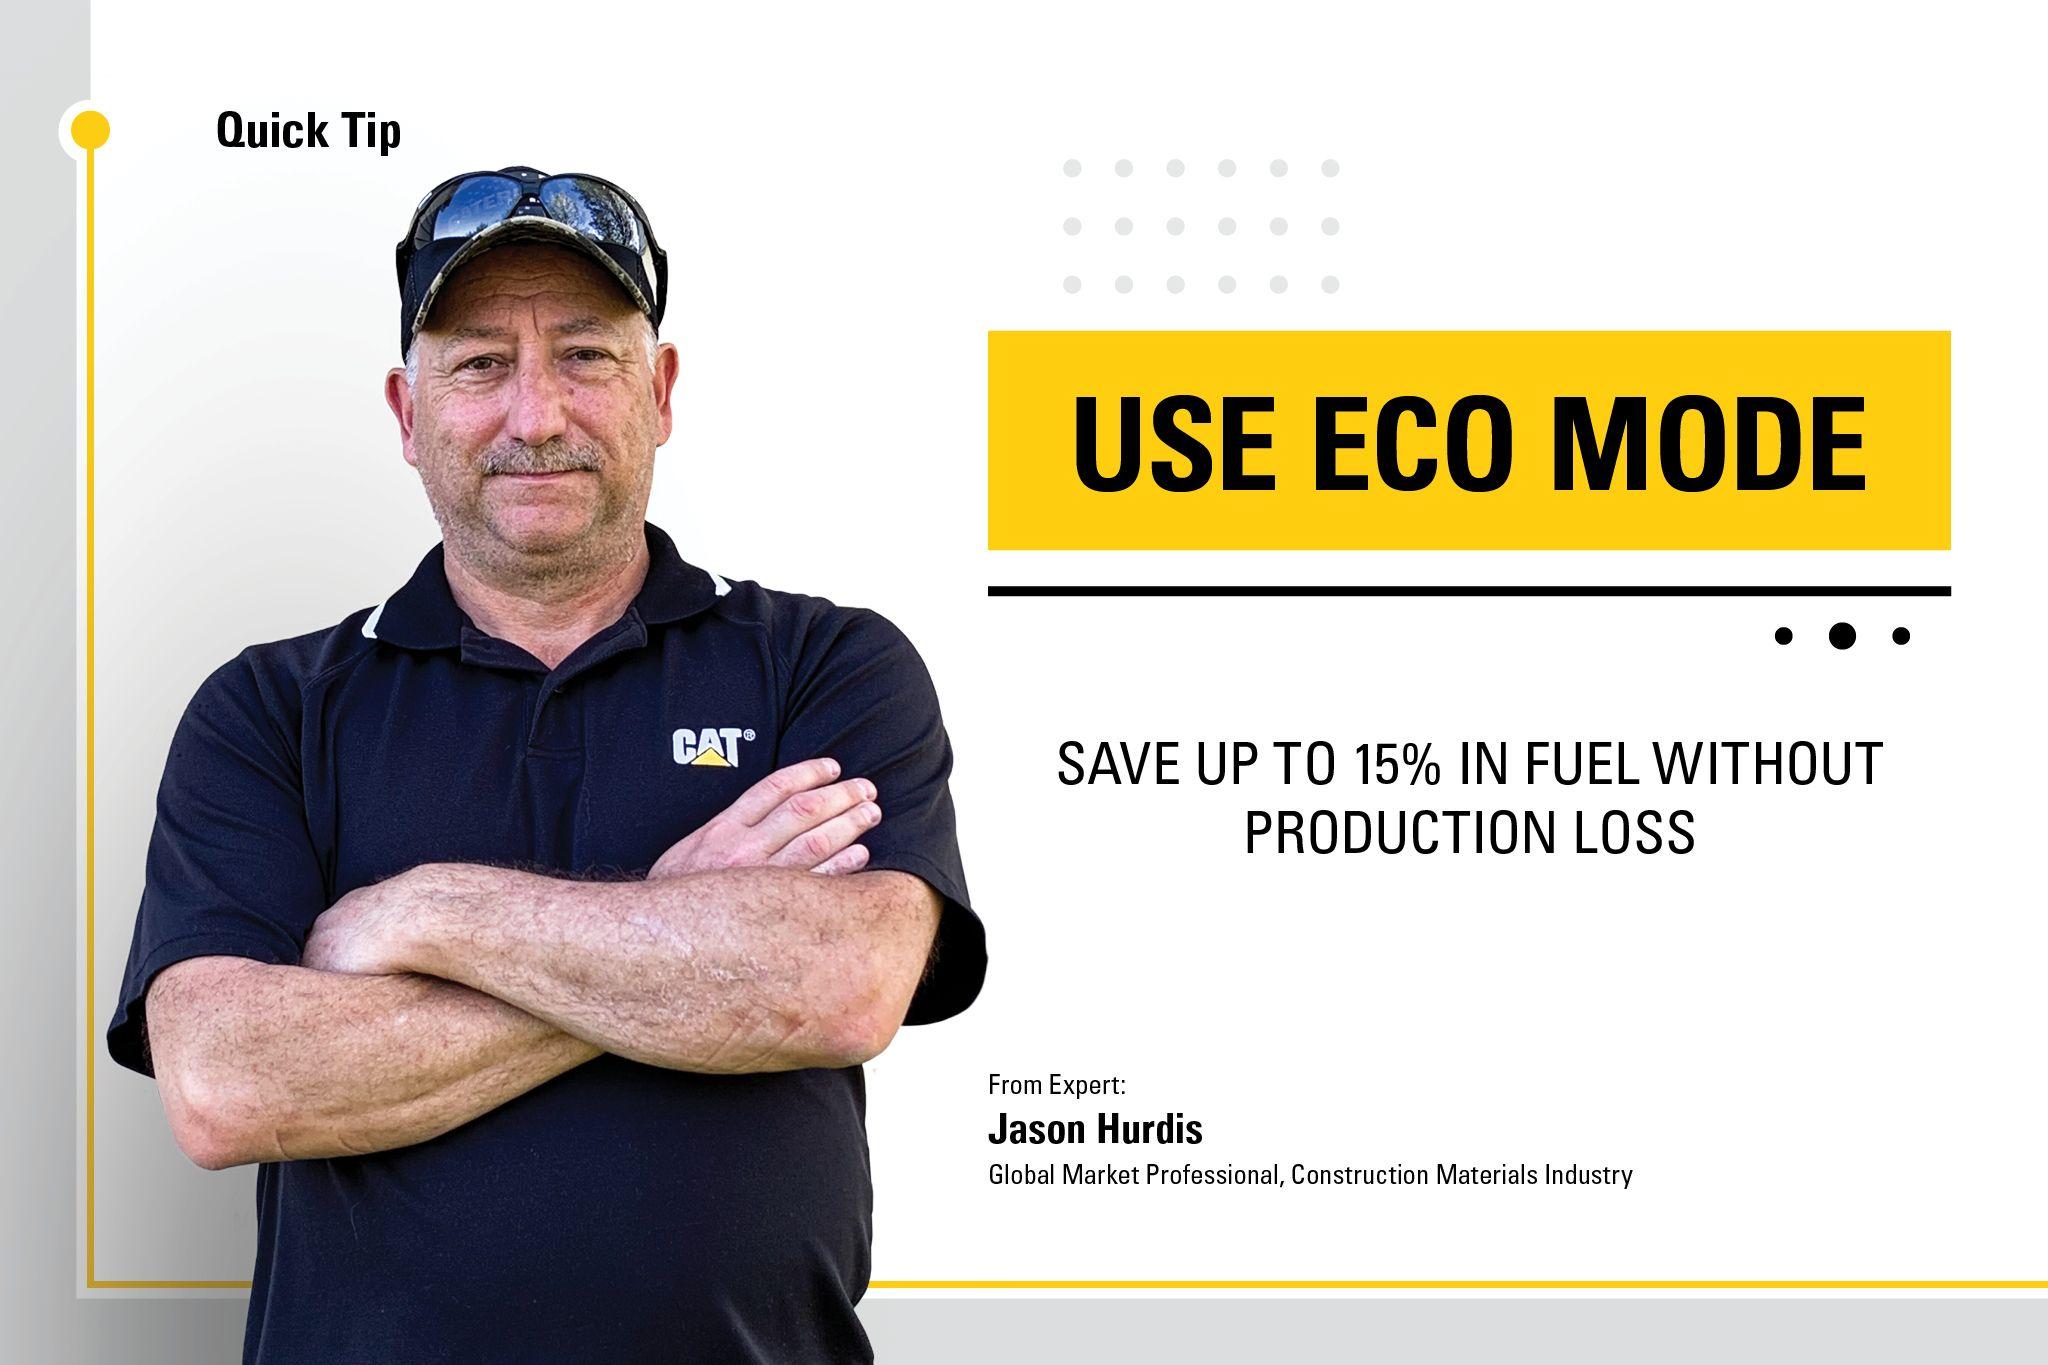 Use Eco Mode